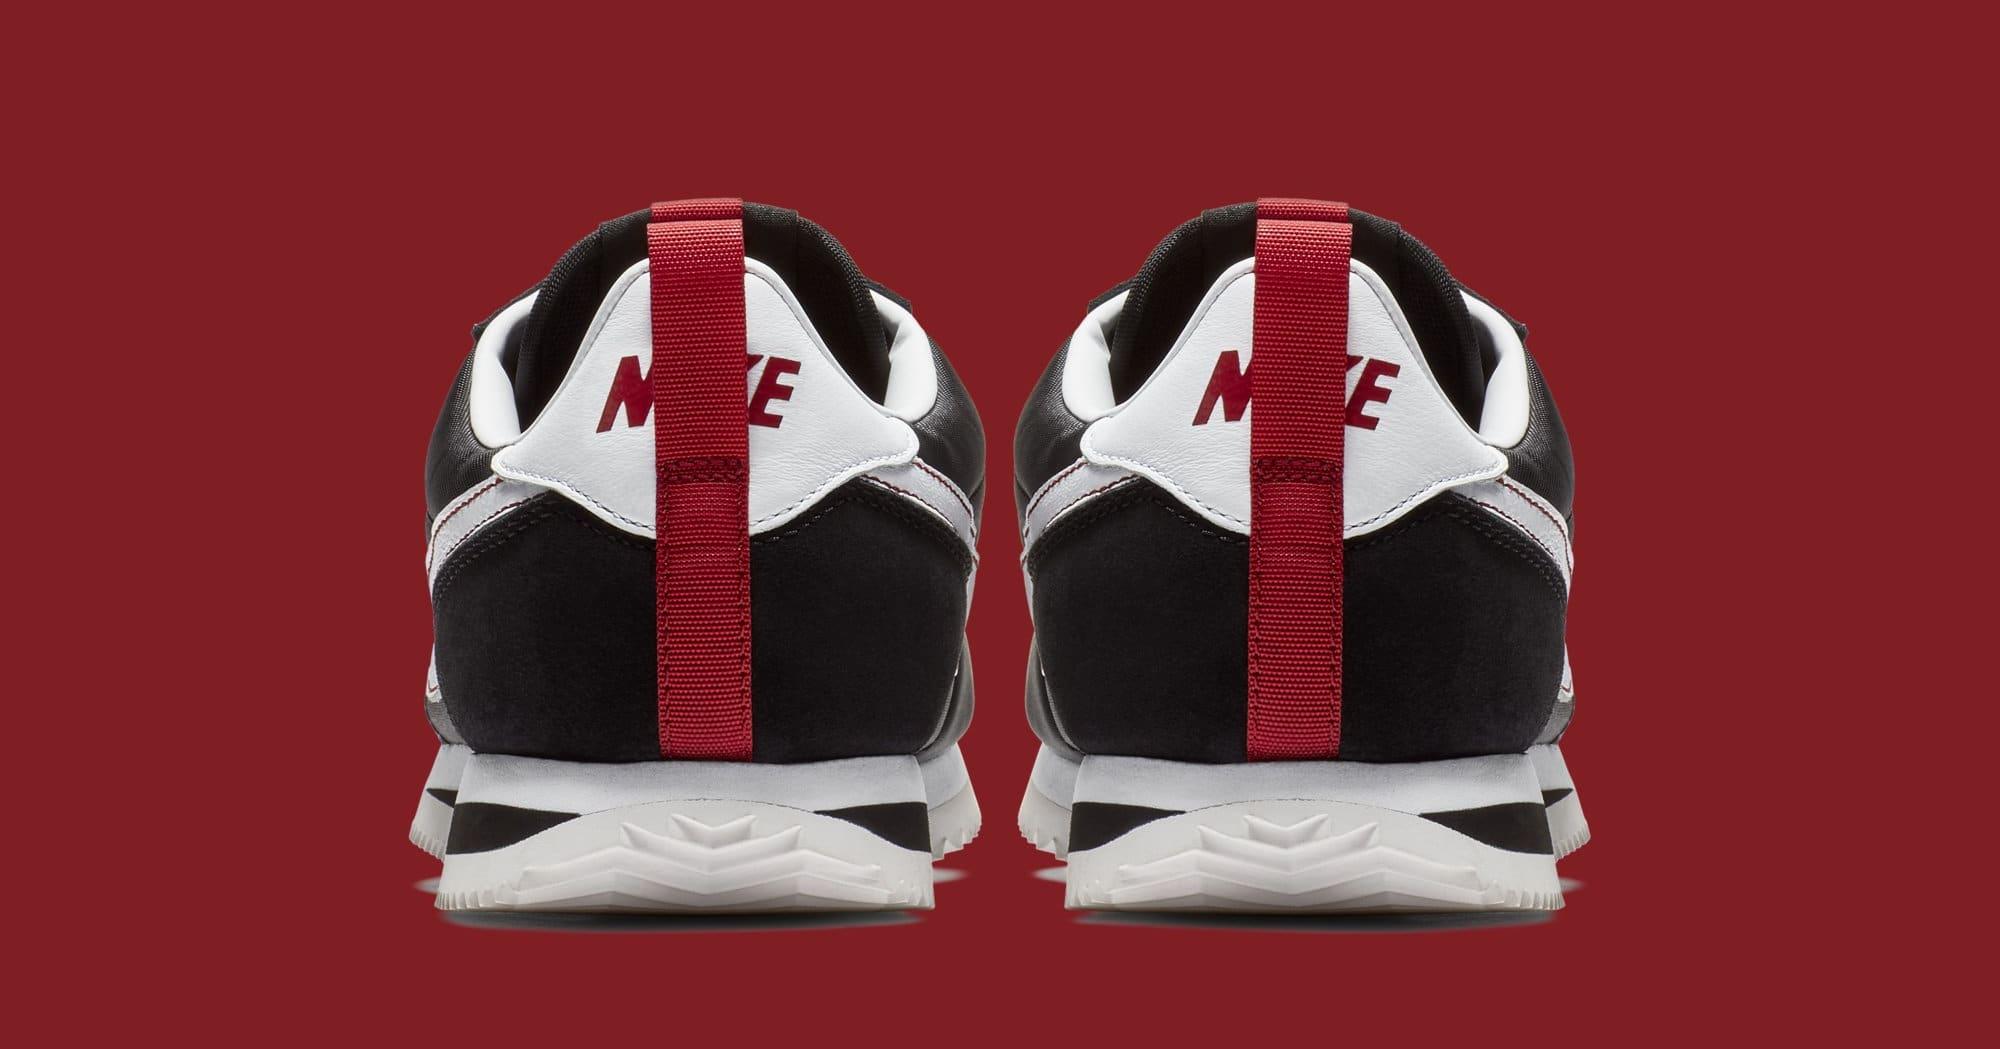 Kendrick Lamar x Nike Cortez Kenny 3 BV0833-016 (Heel)